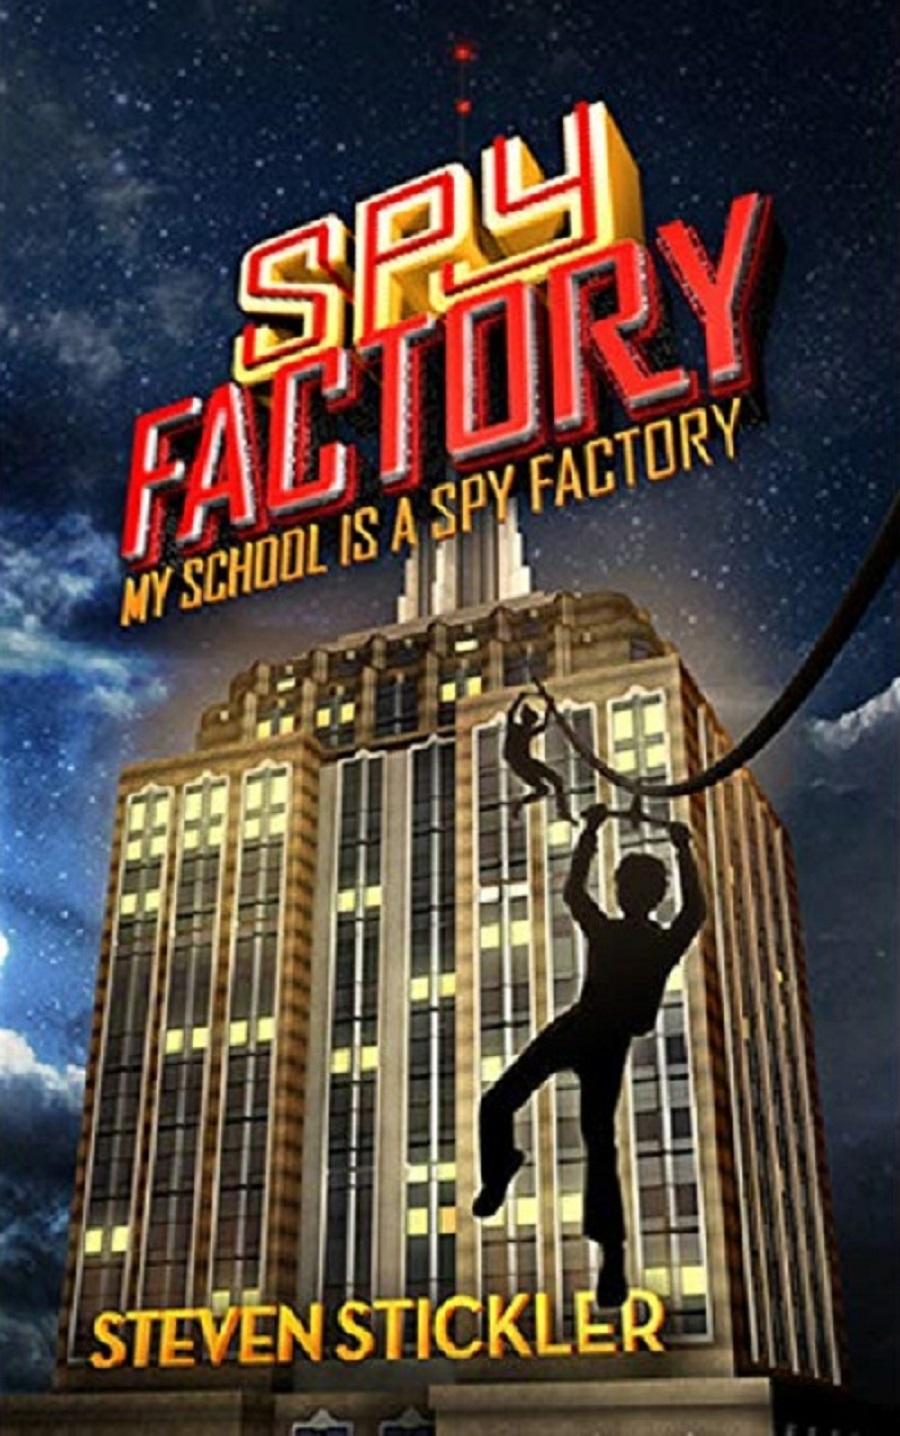 My School is a Spy Factory